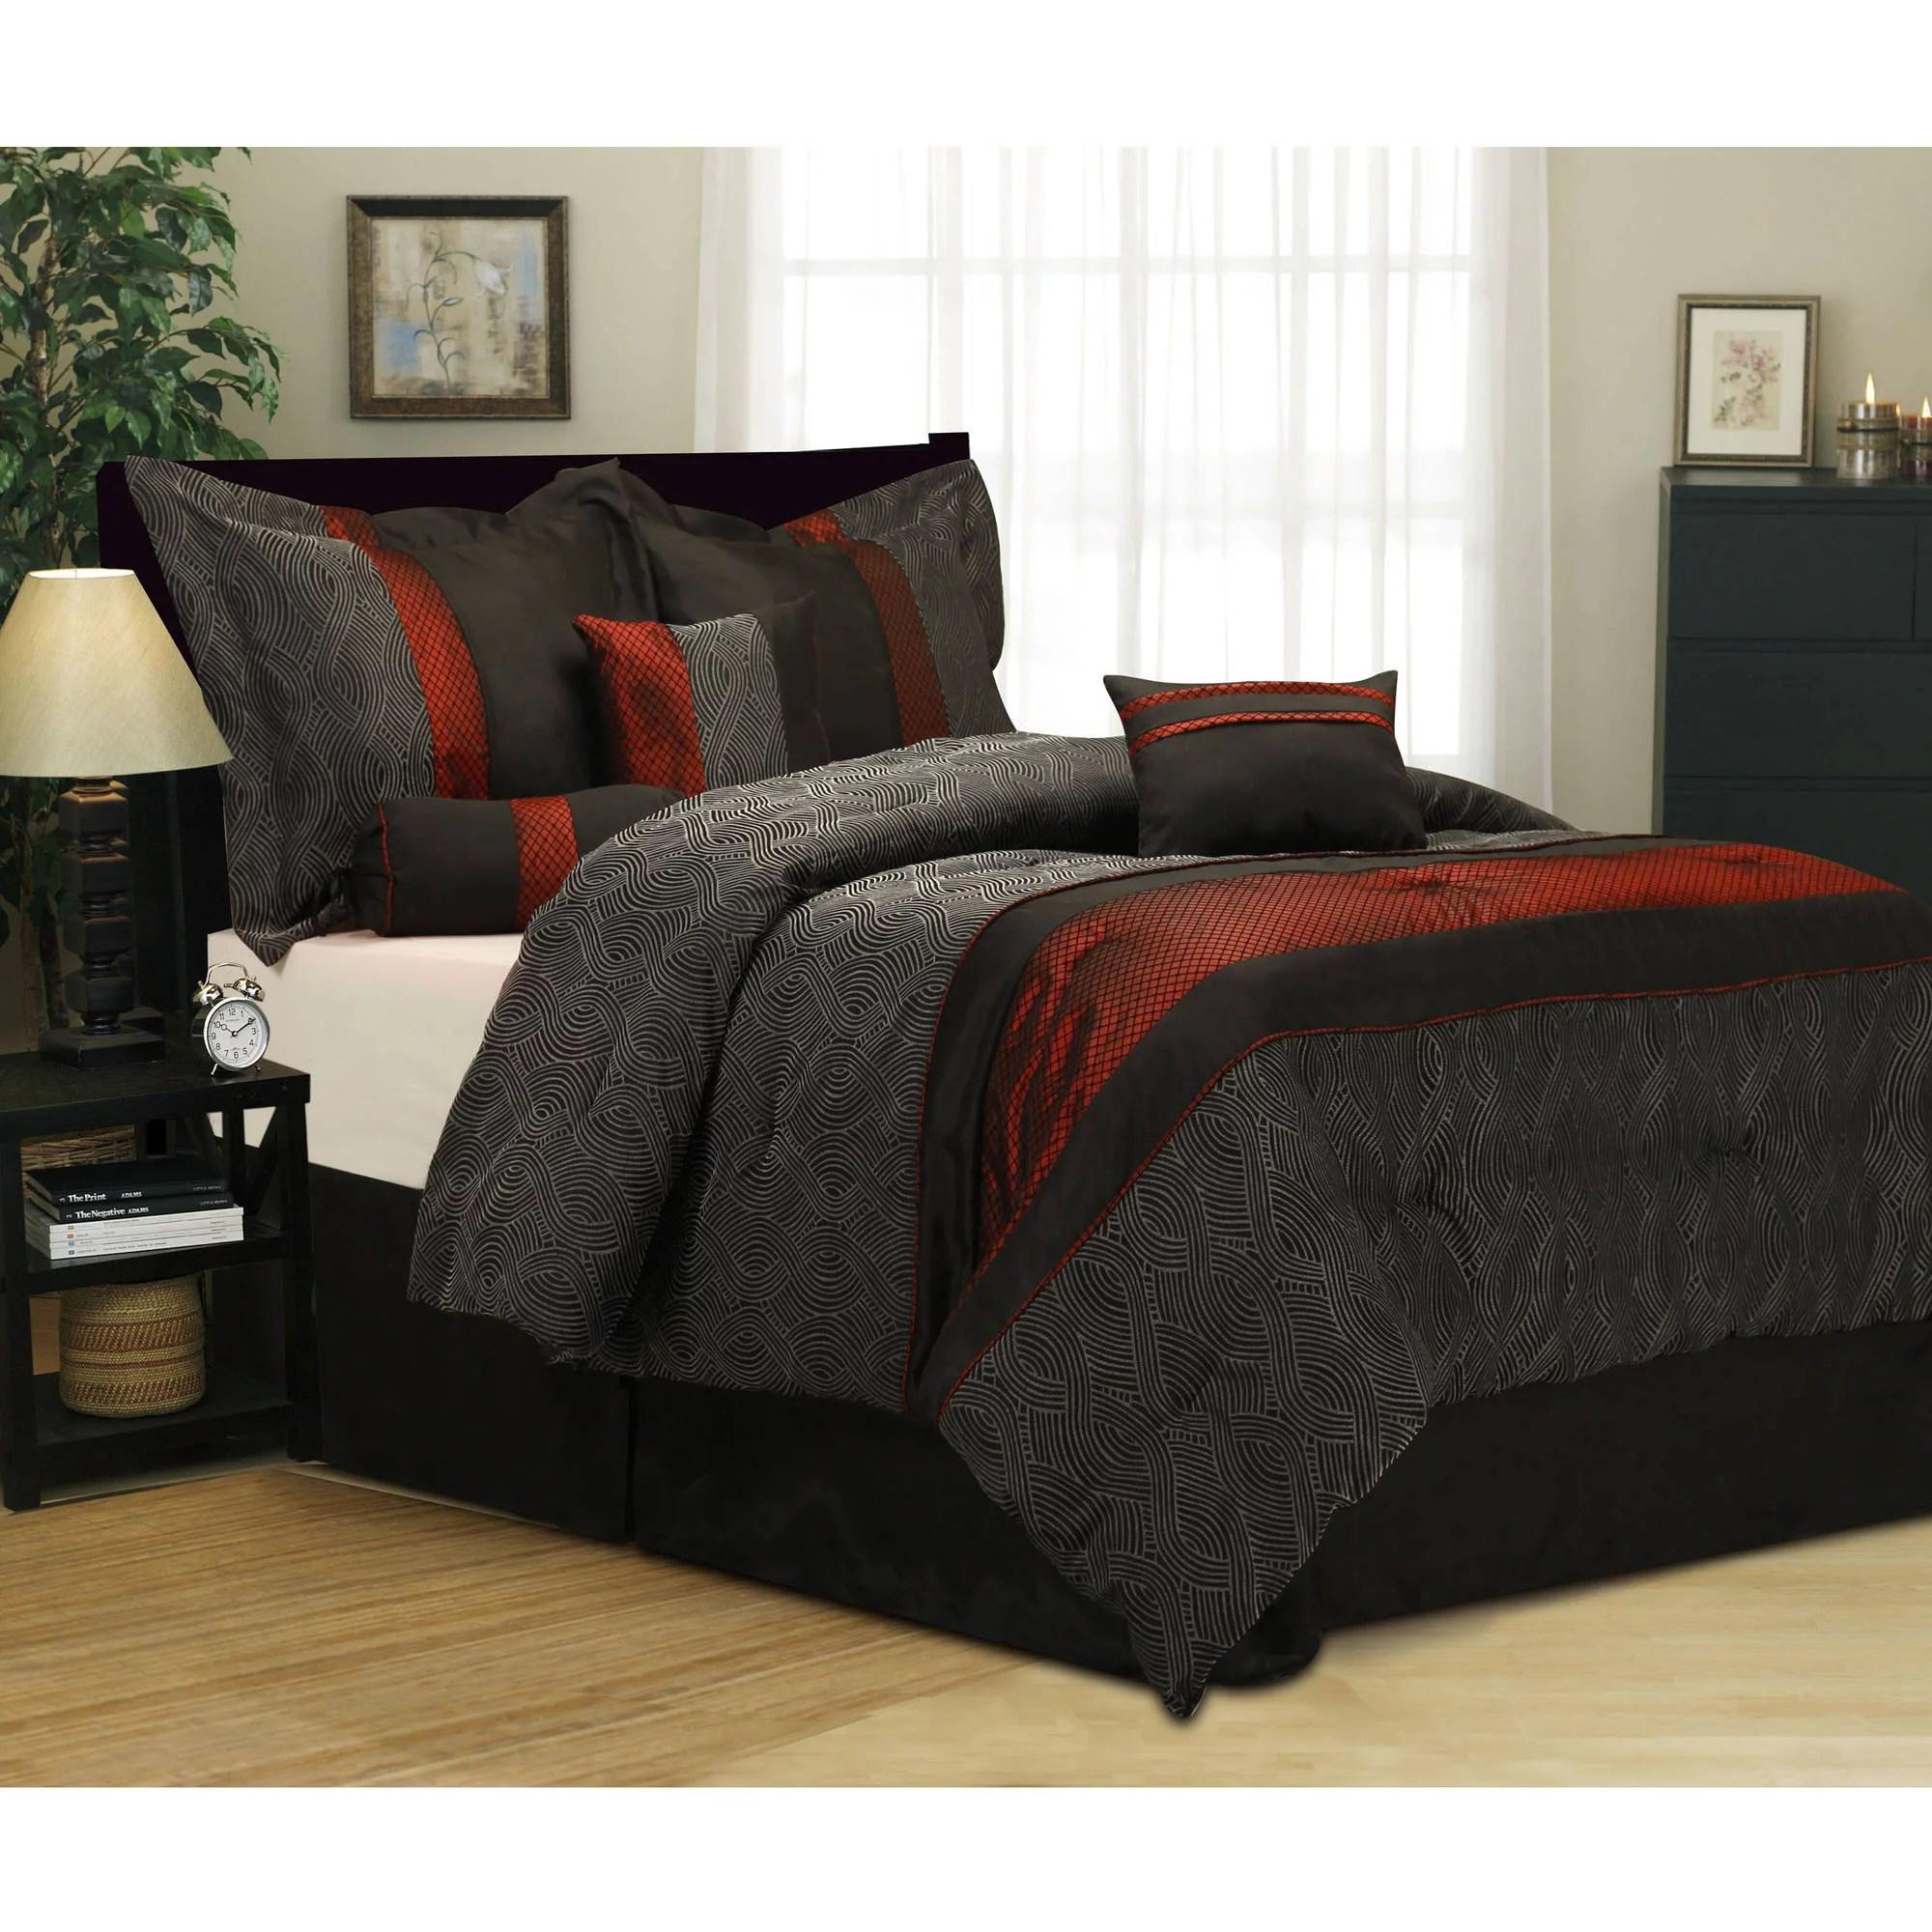 details about 7 piece bedding comforter set queen size black red shams pillows bedskirt room